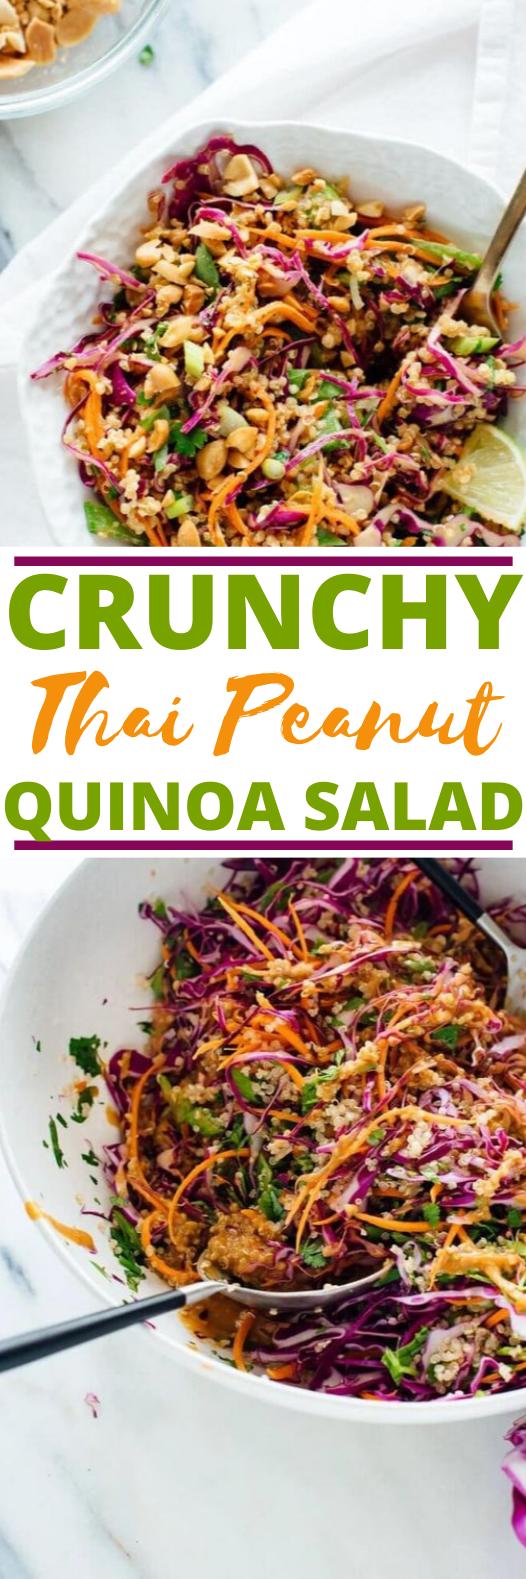 Crunchy Thai Peanut & Quinoa Salad #vegan #healthy #glutenfree #sidedish #salad